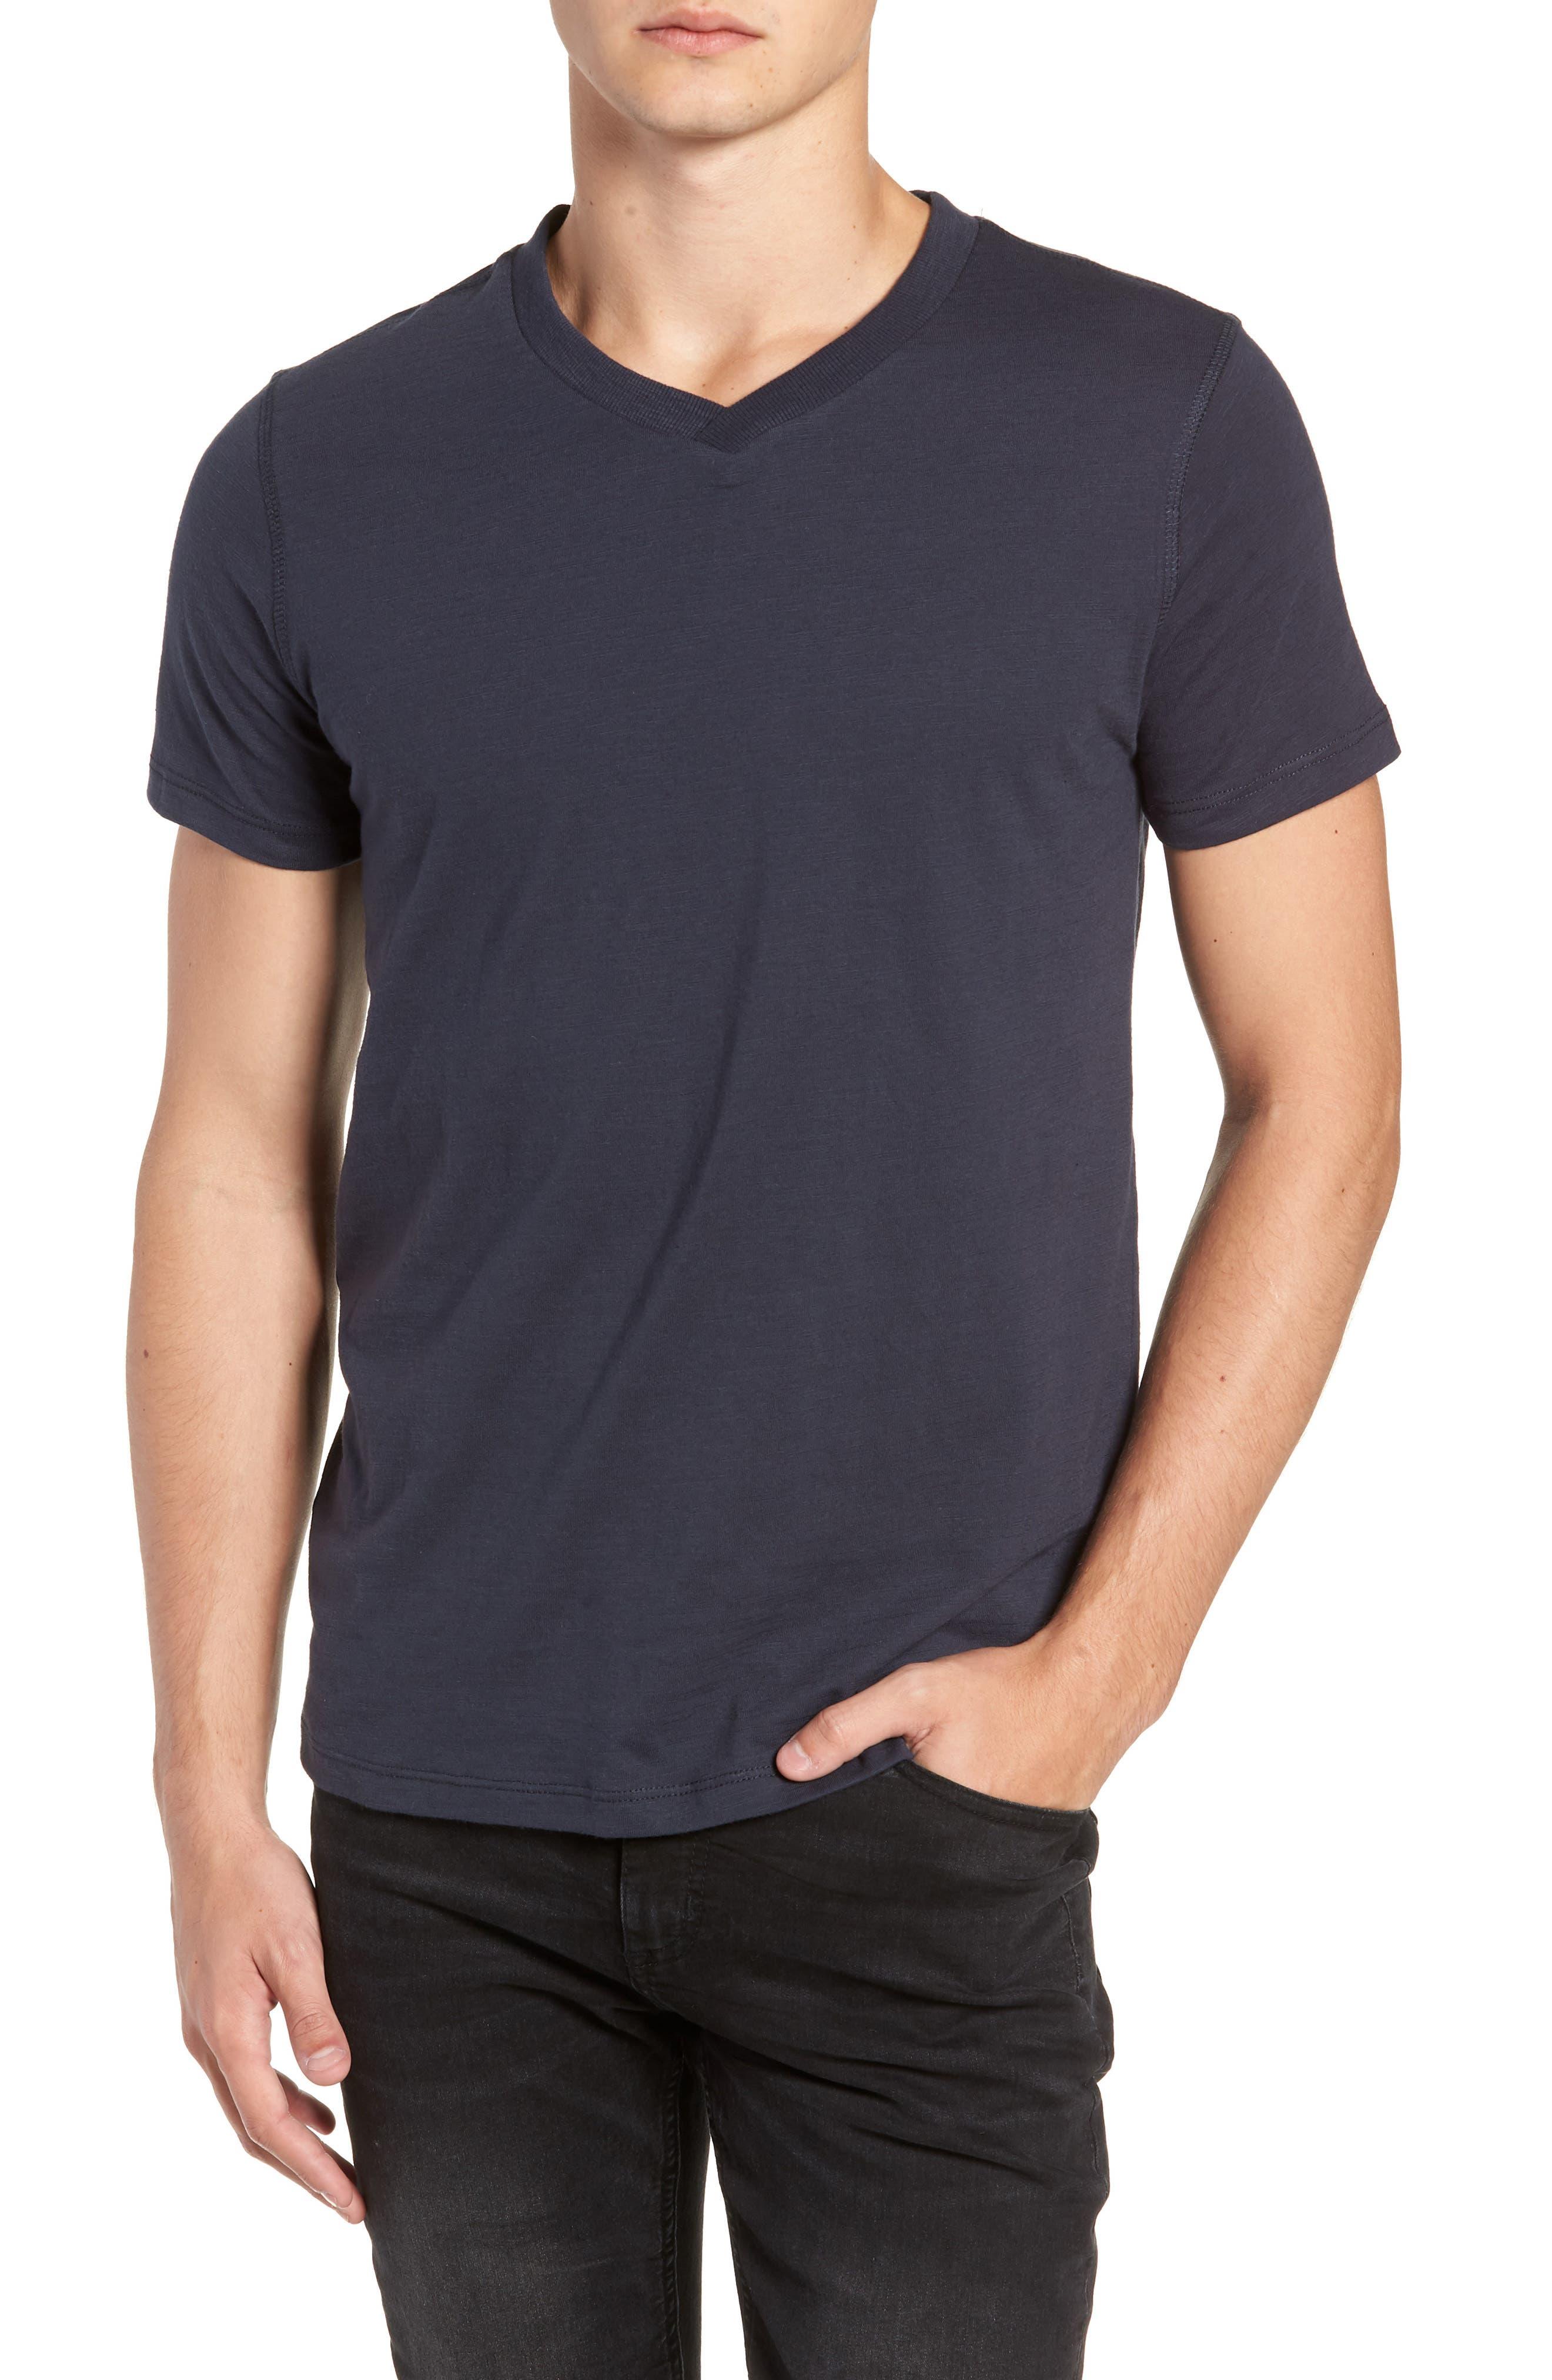 Soccer V-Neck T-Shirt,                             Main thumbnail 1, color,                             CARBON